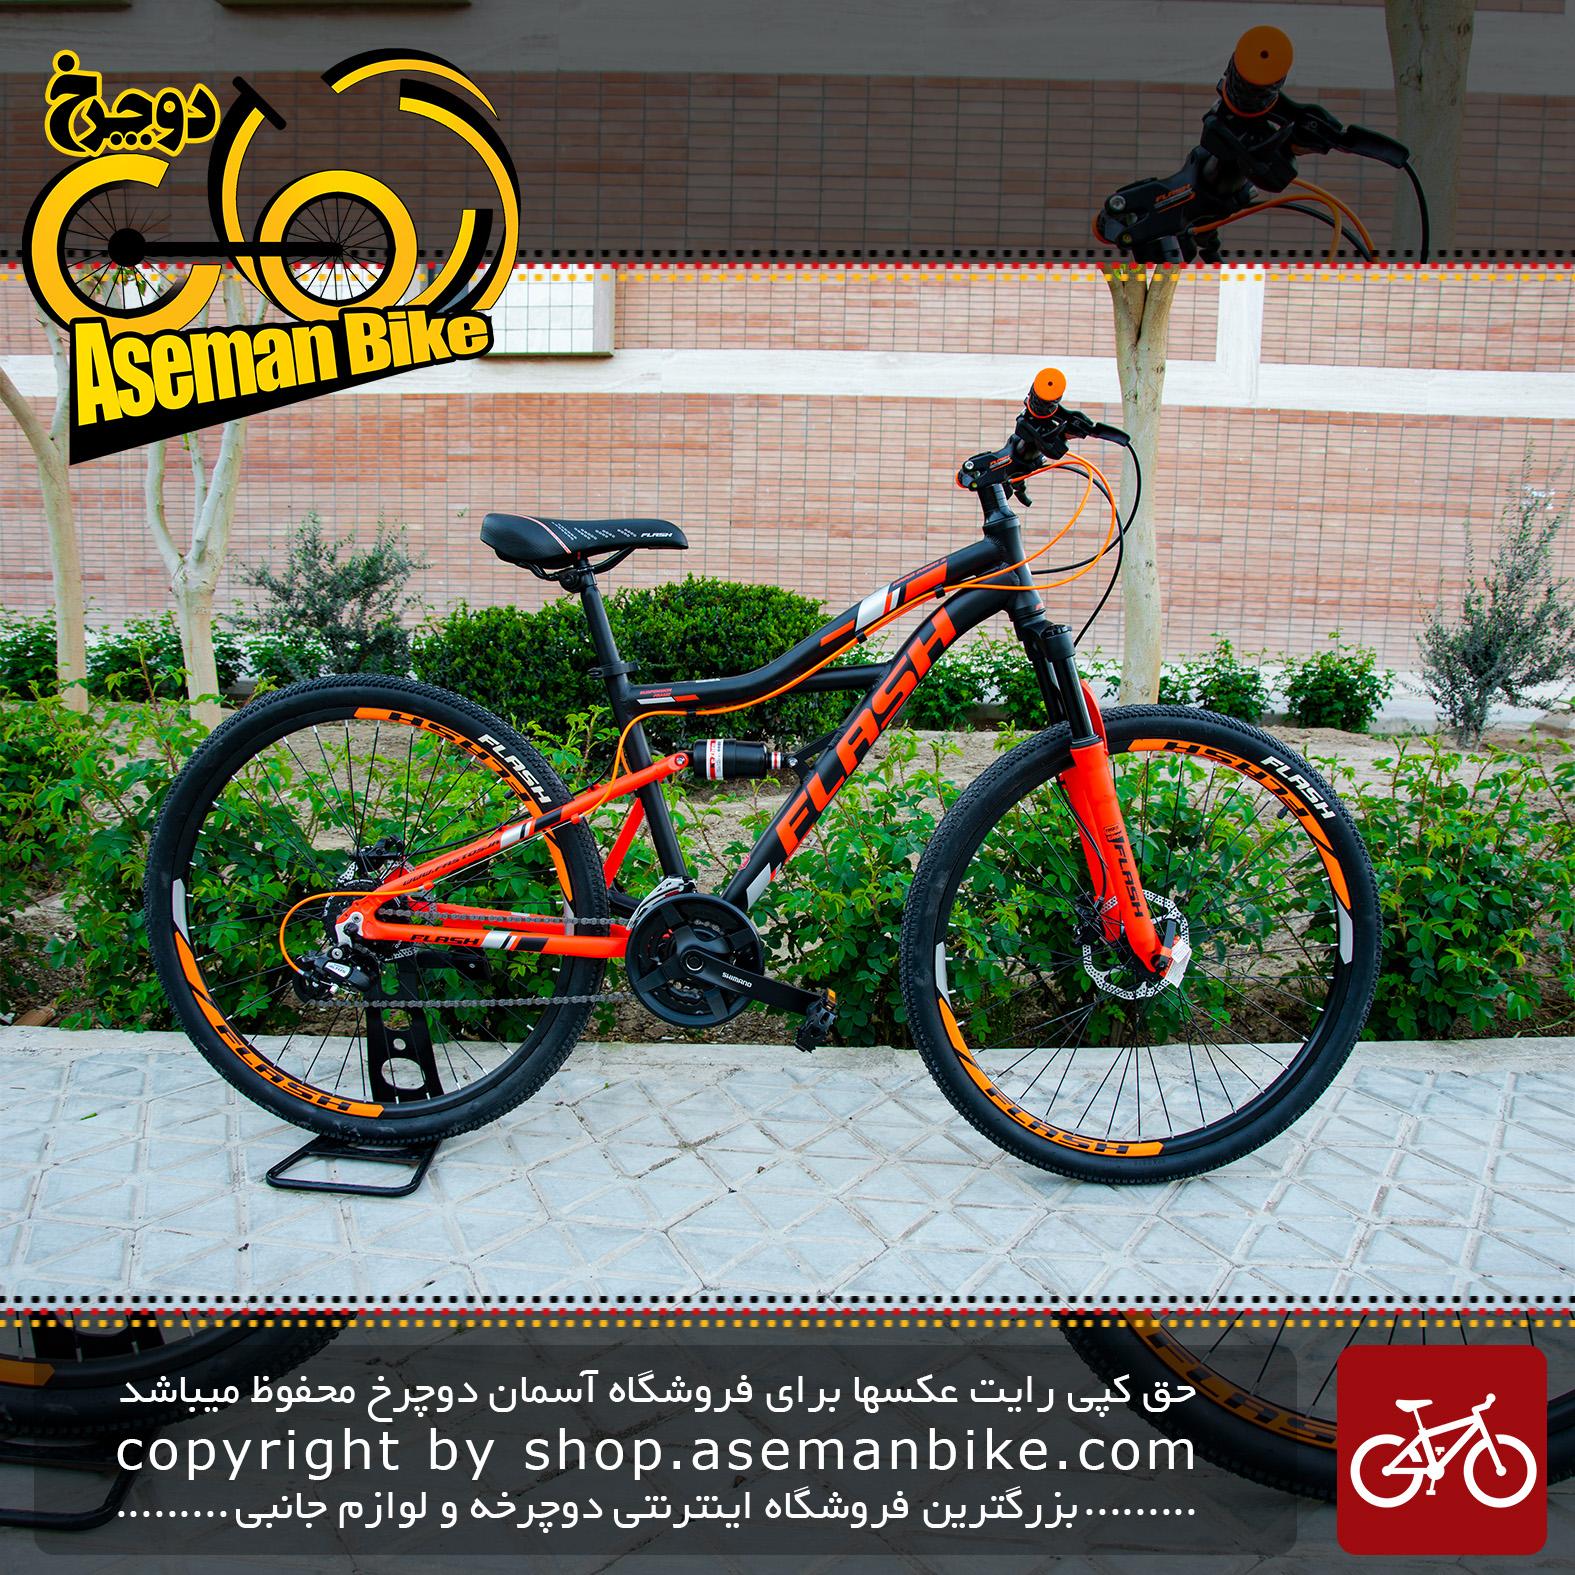 دوچرخه کوهستان فول ساسپنشن فلش مدل هاردراک 3 سایز 27.5 Flash Full Suspension Bicycle Hard Rock 3